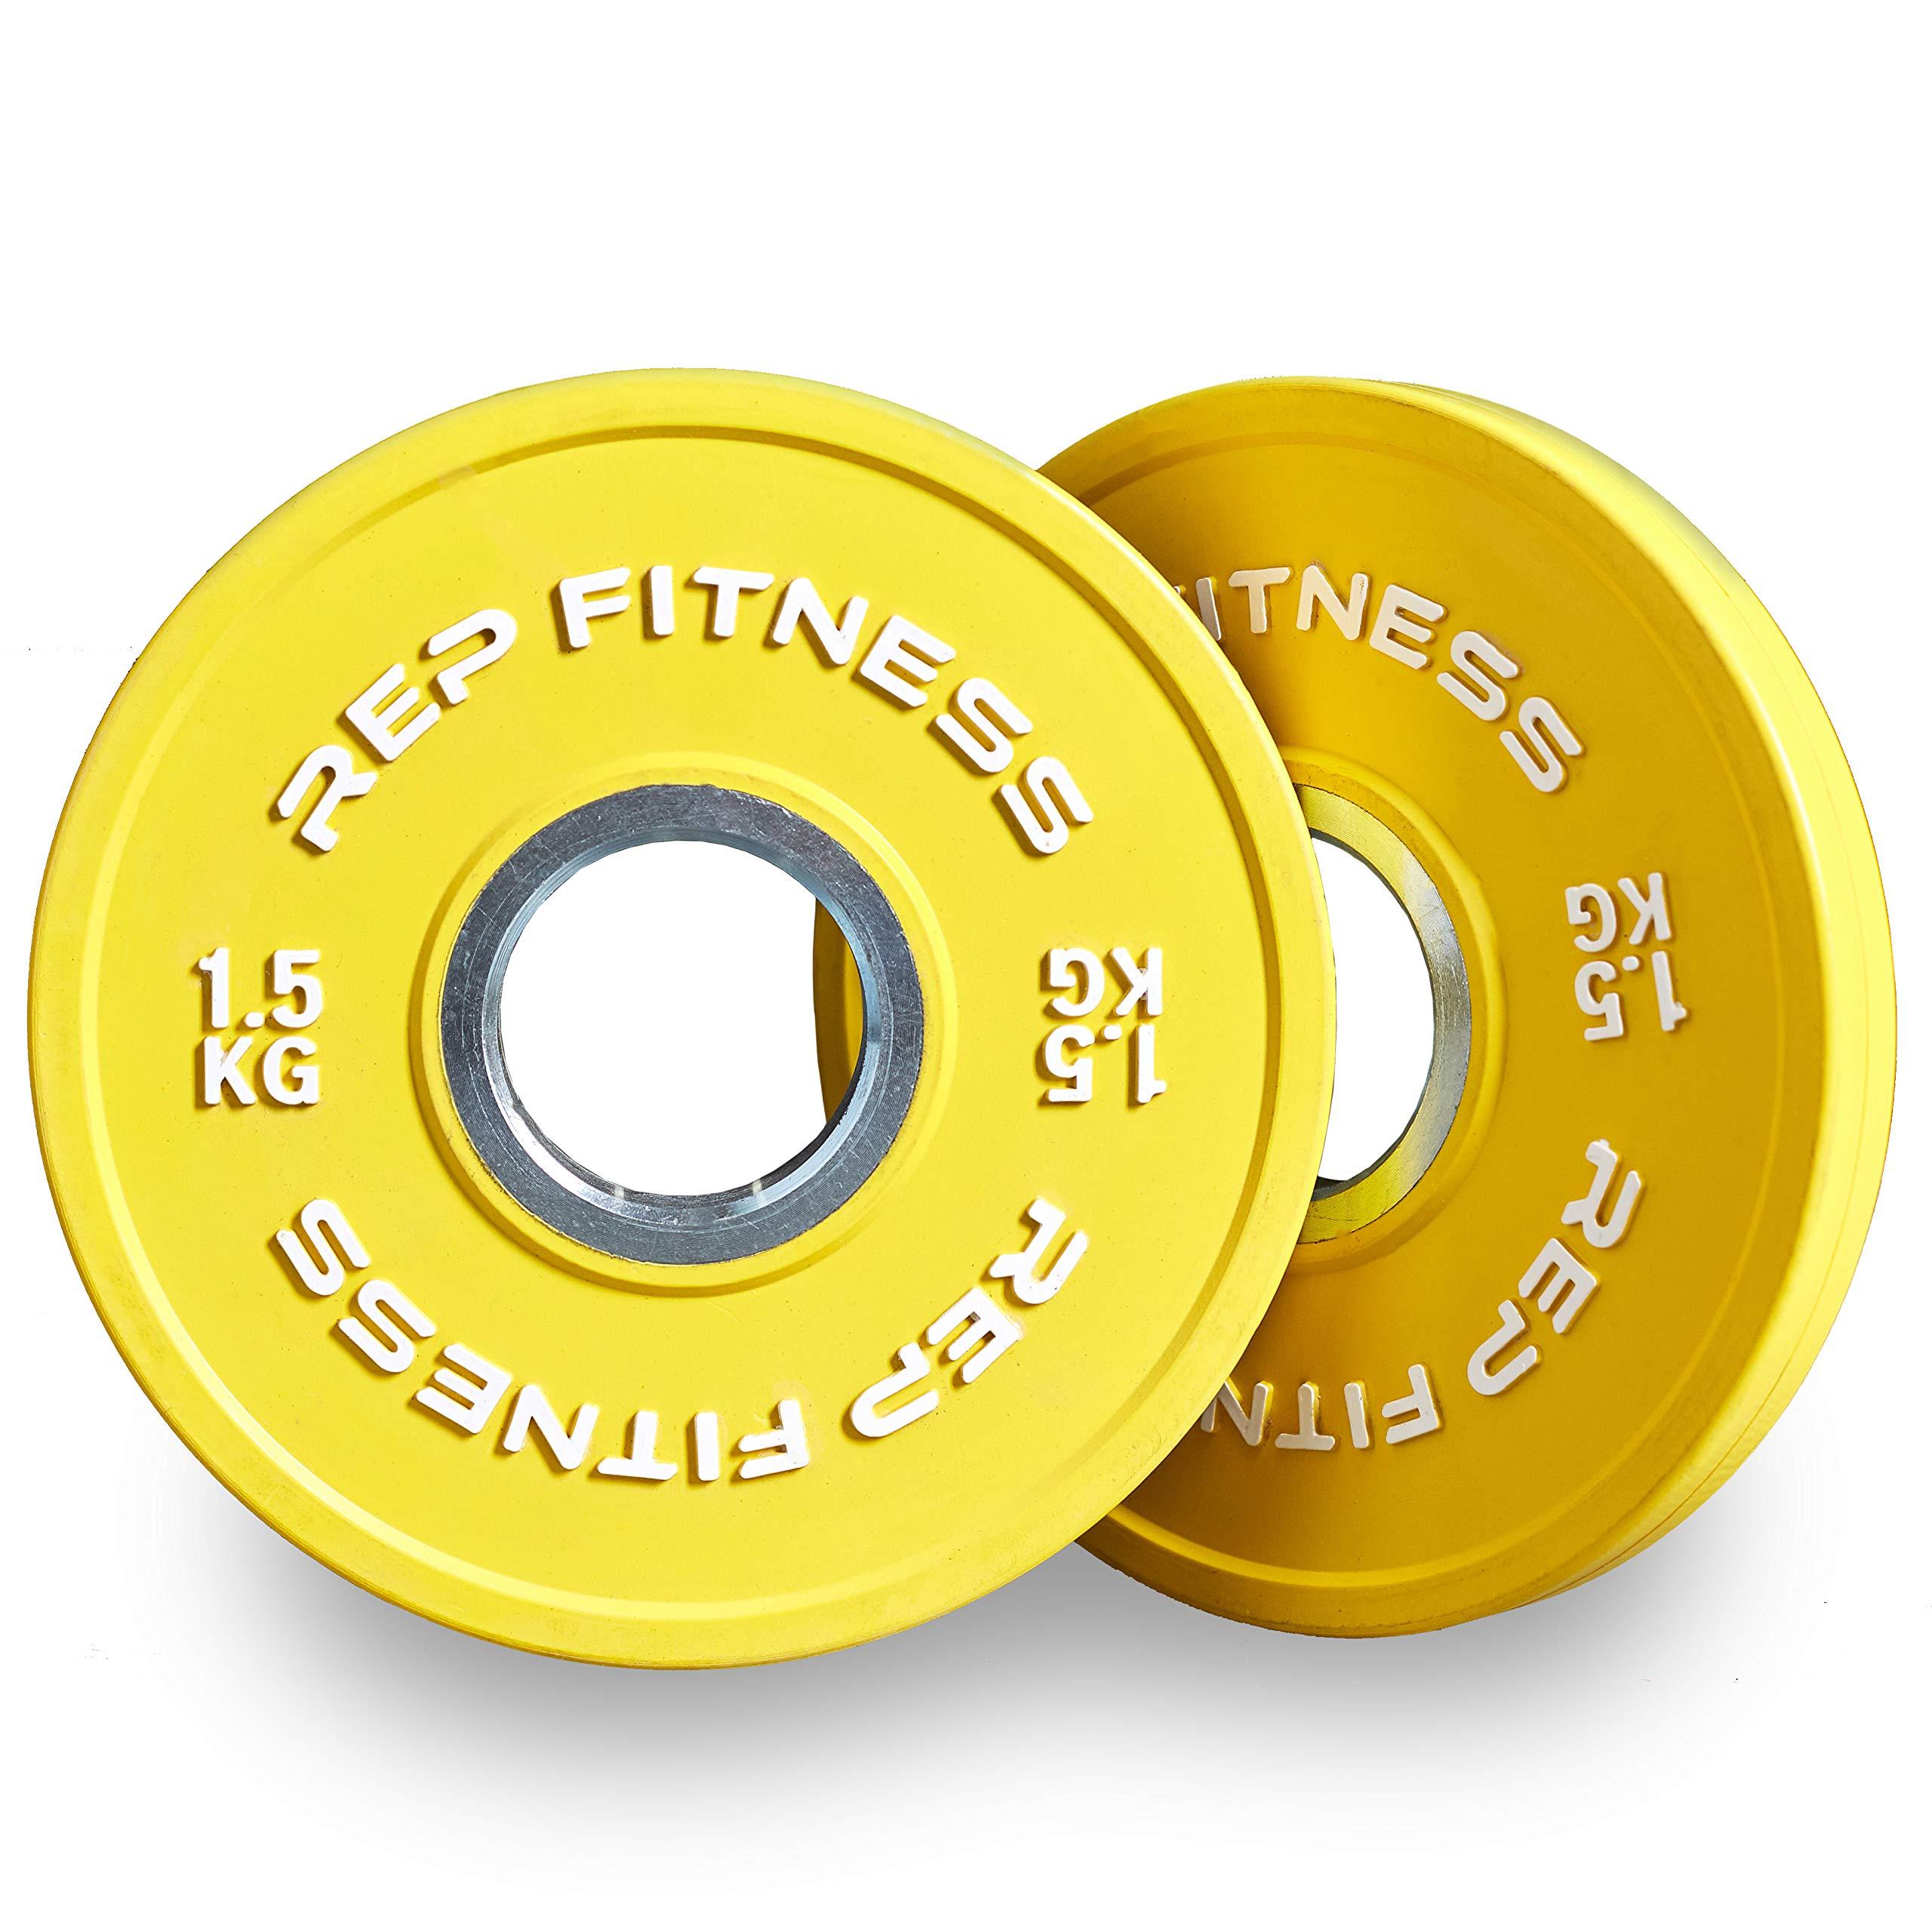 Rep Change Plates - 1.5 kg